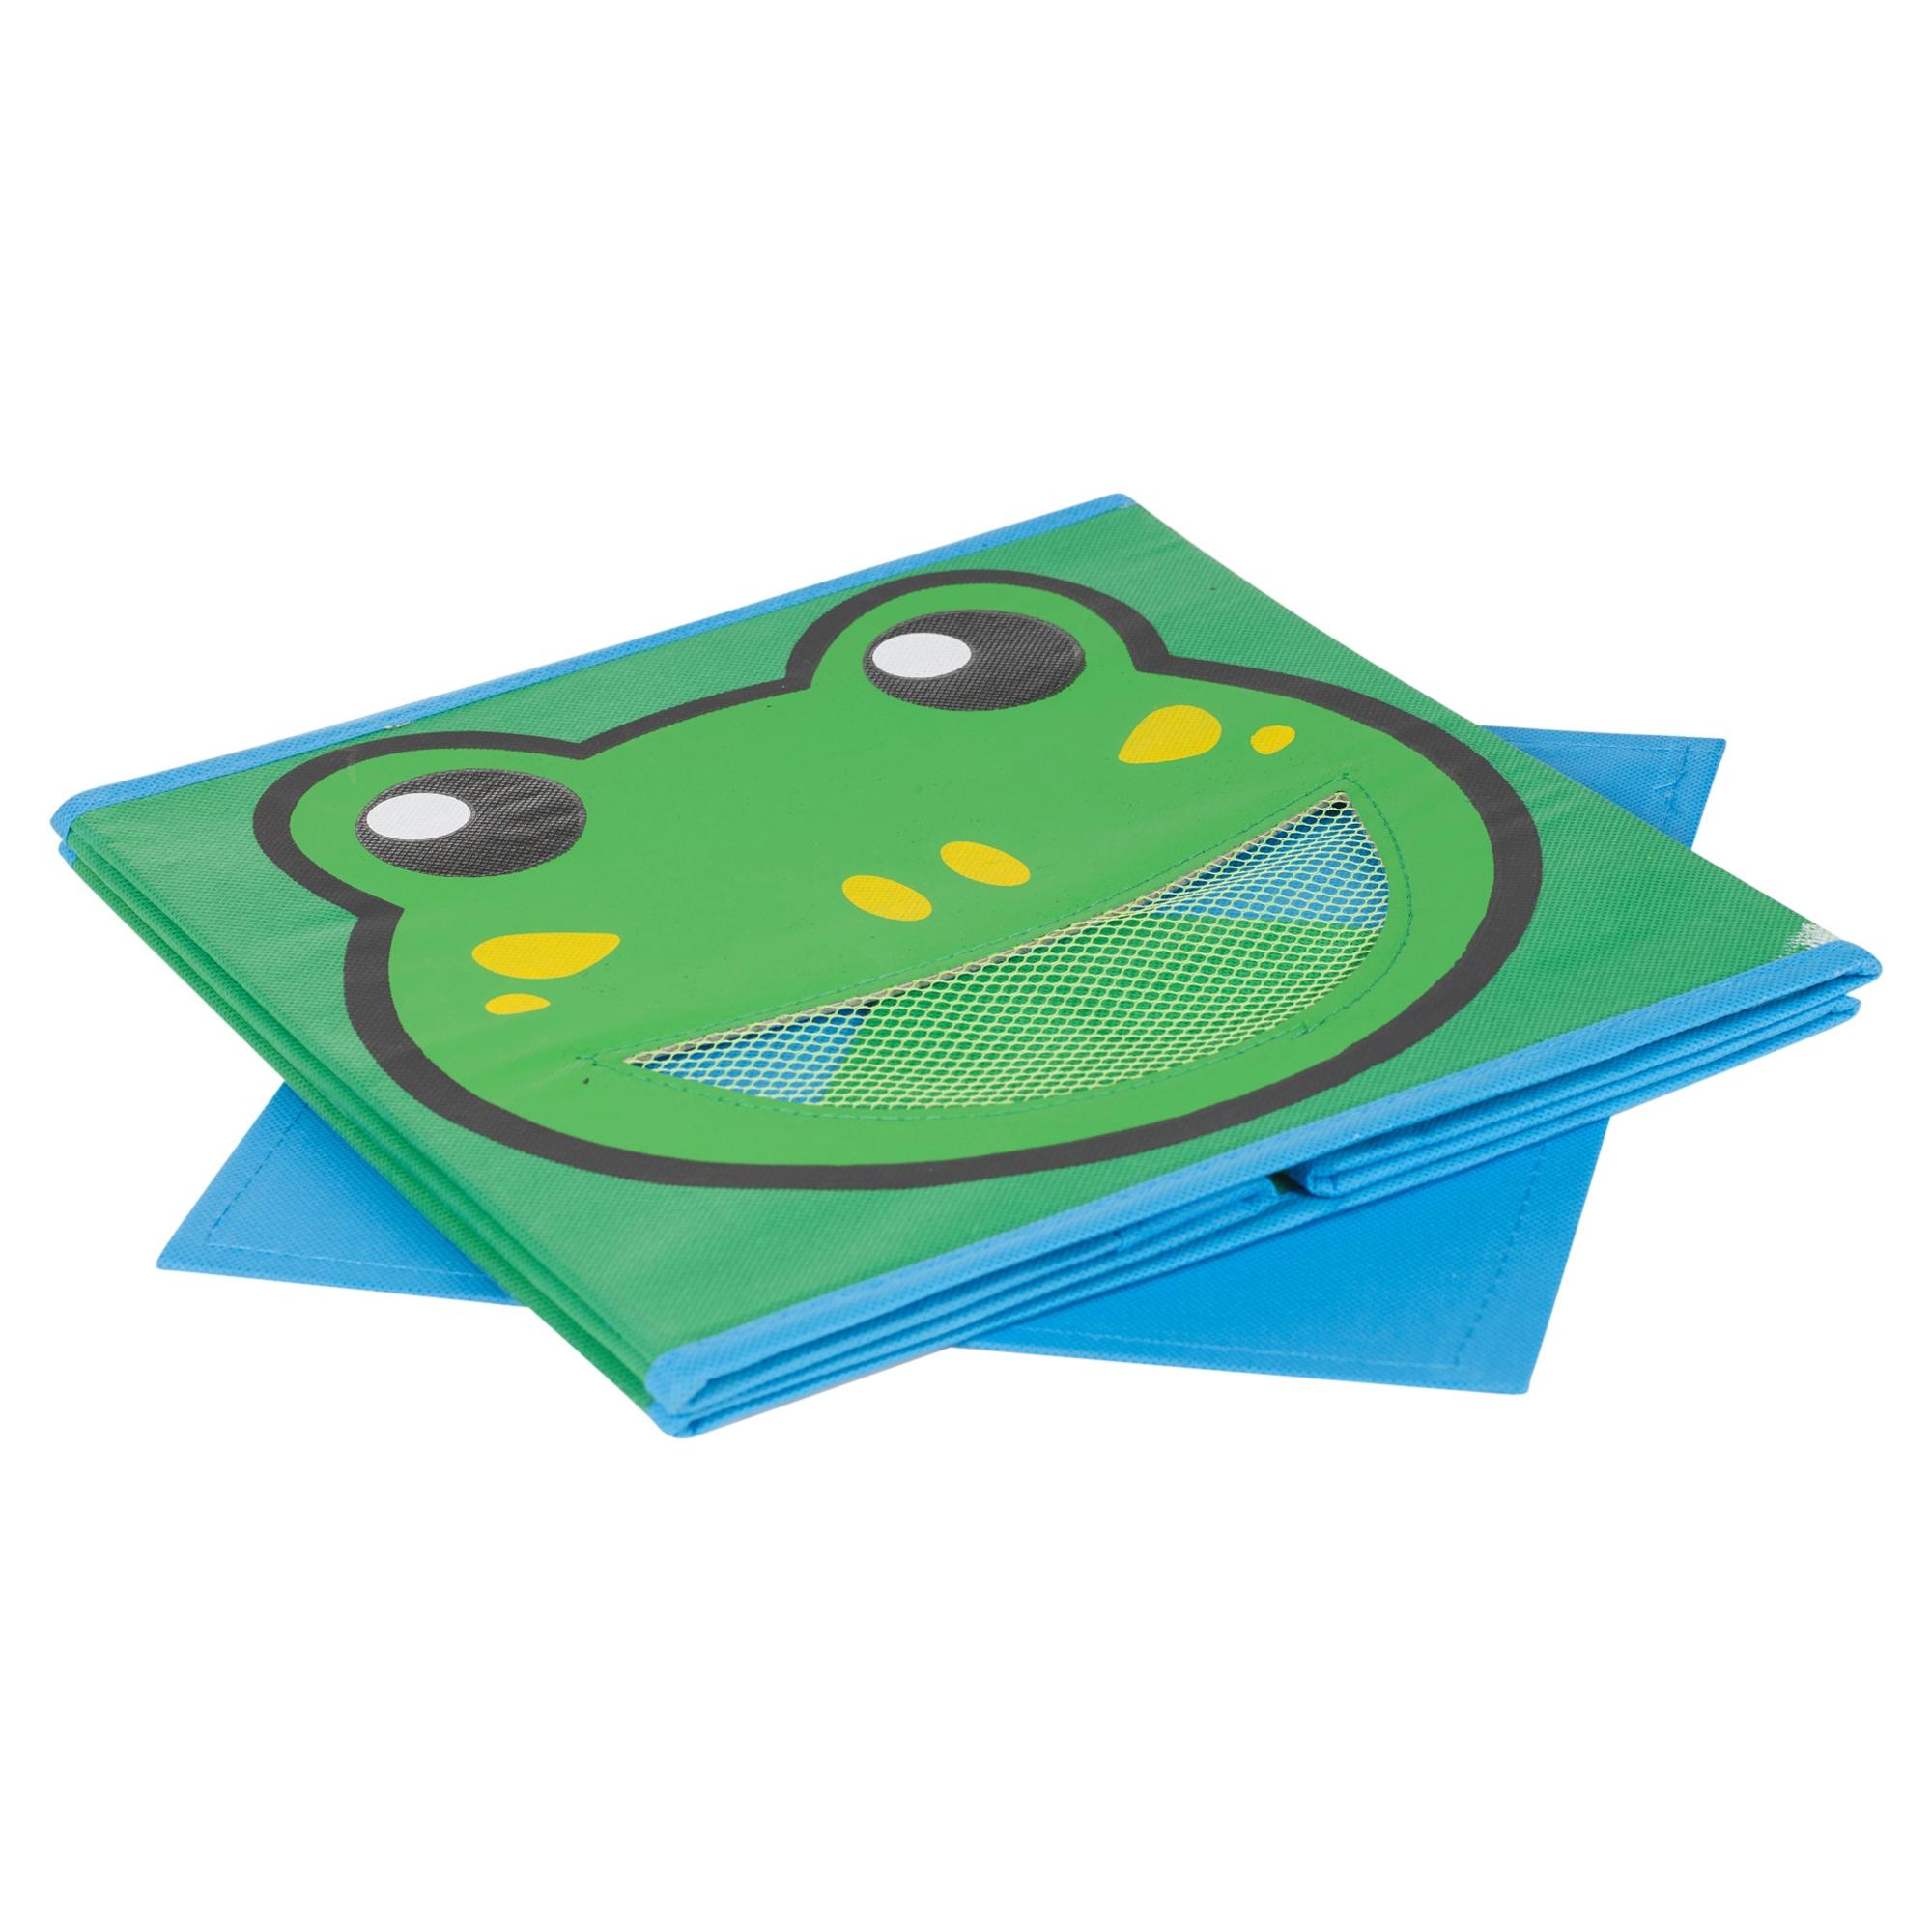 Ni os juguetes animal caja almacenaje no tejidos tela - Cajas tela almacenaje ...